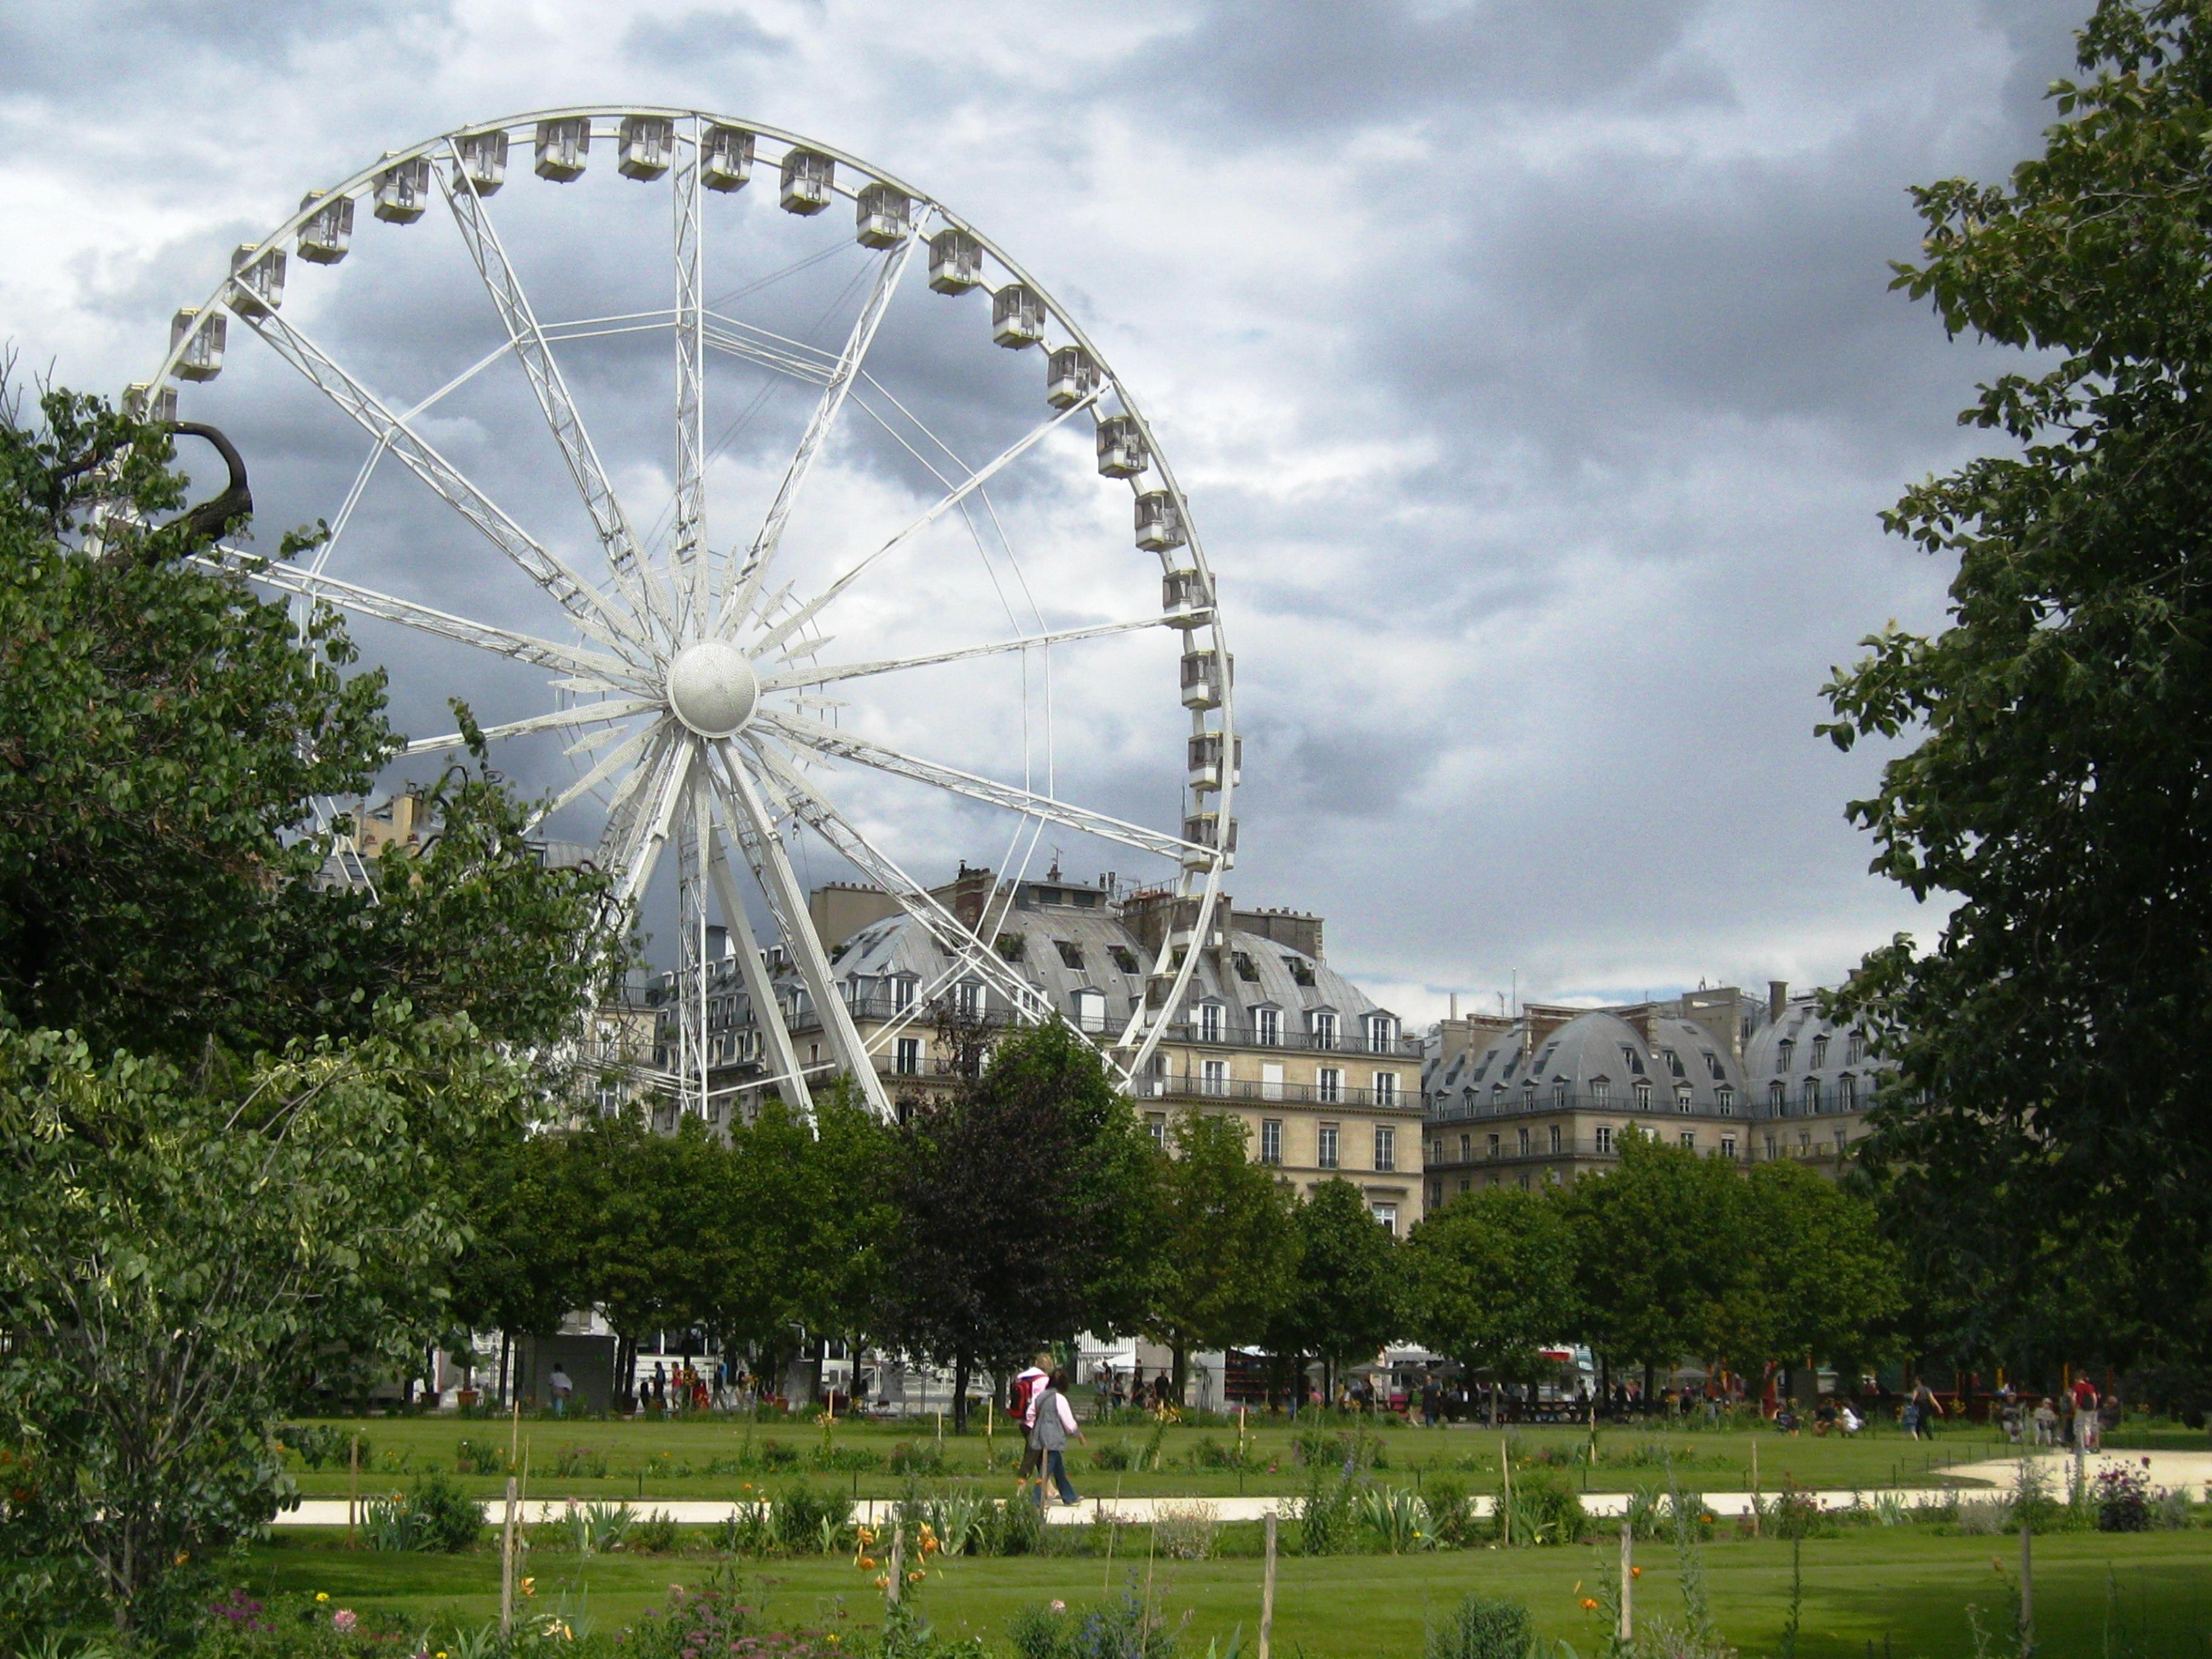 Jardin des tuileries ritournelle for Jardin des tuileries